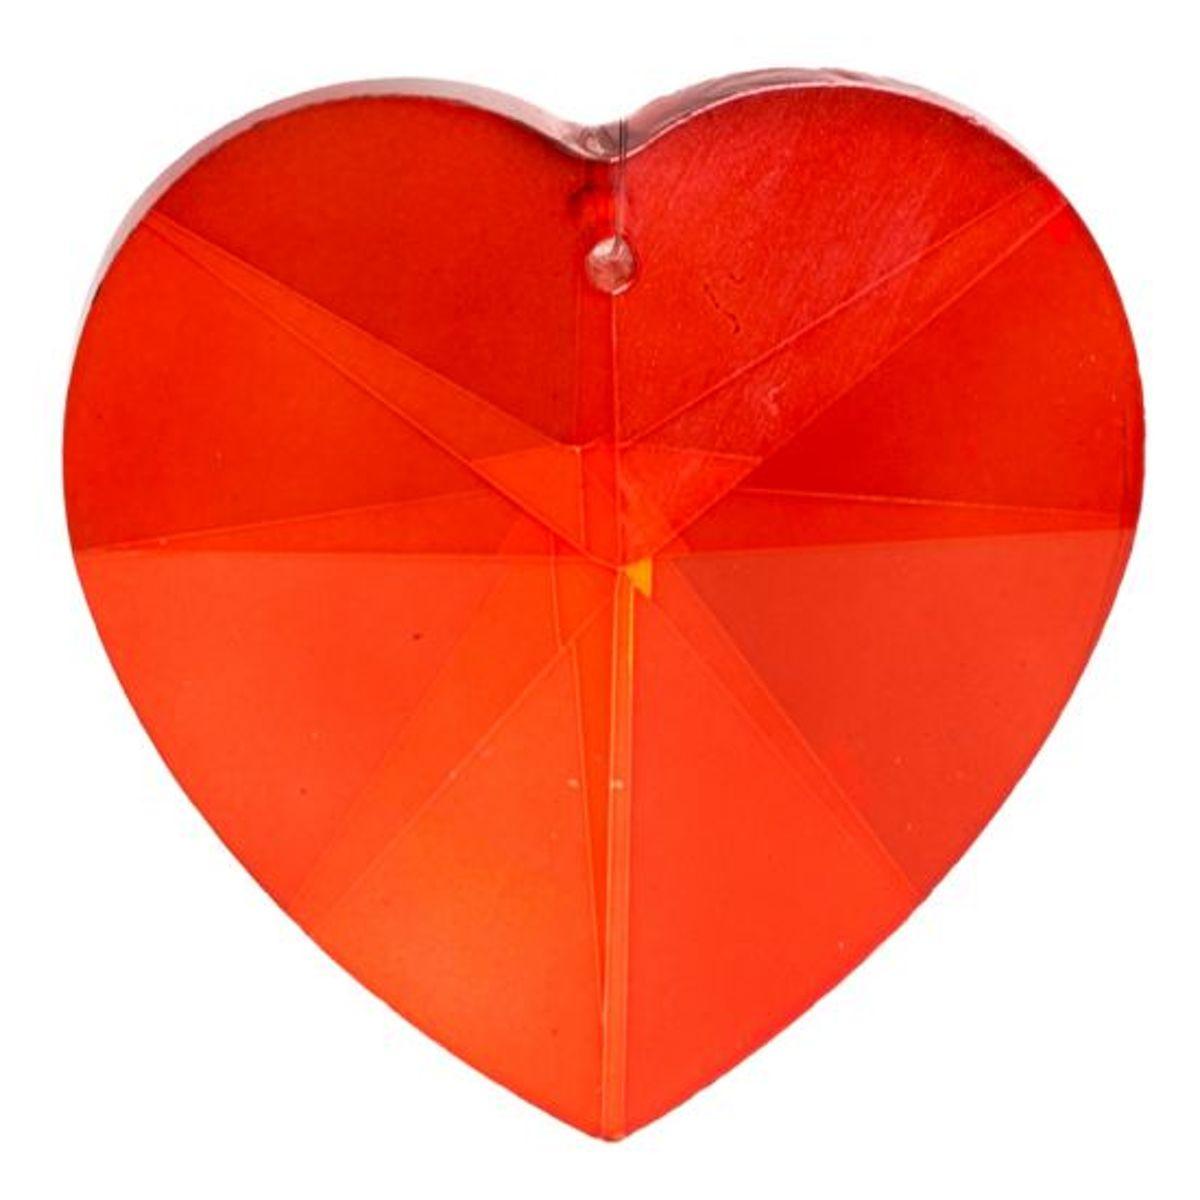 Yogi & Yogini naturals Regenboogkristal hartvorm rood (5 cm) kopen